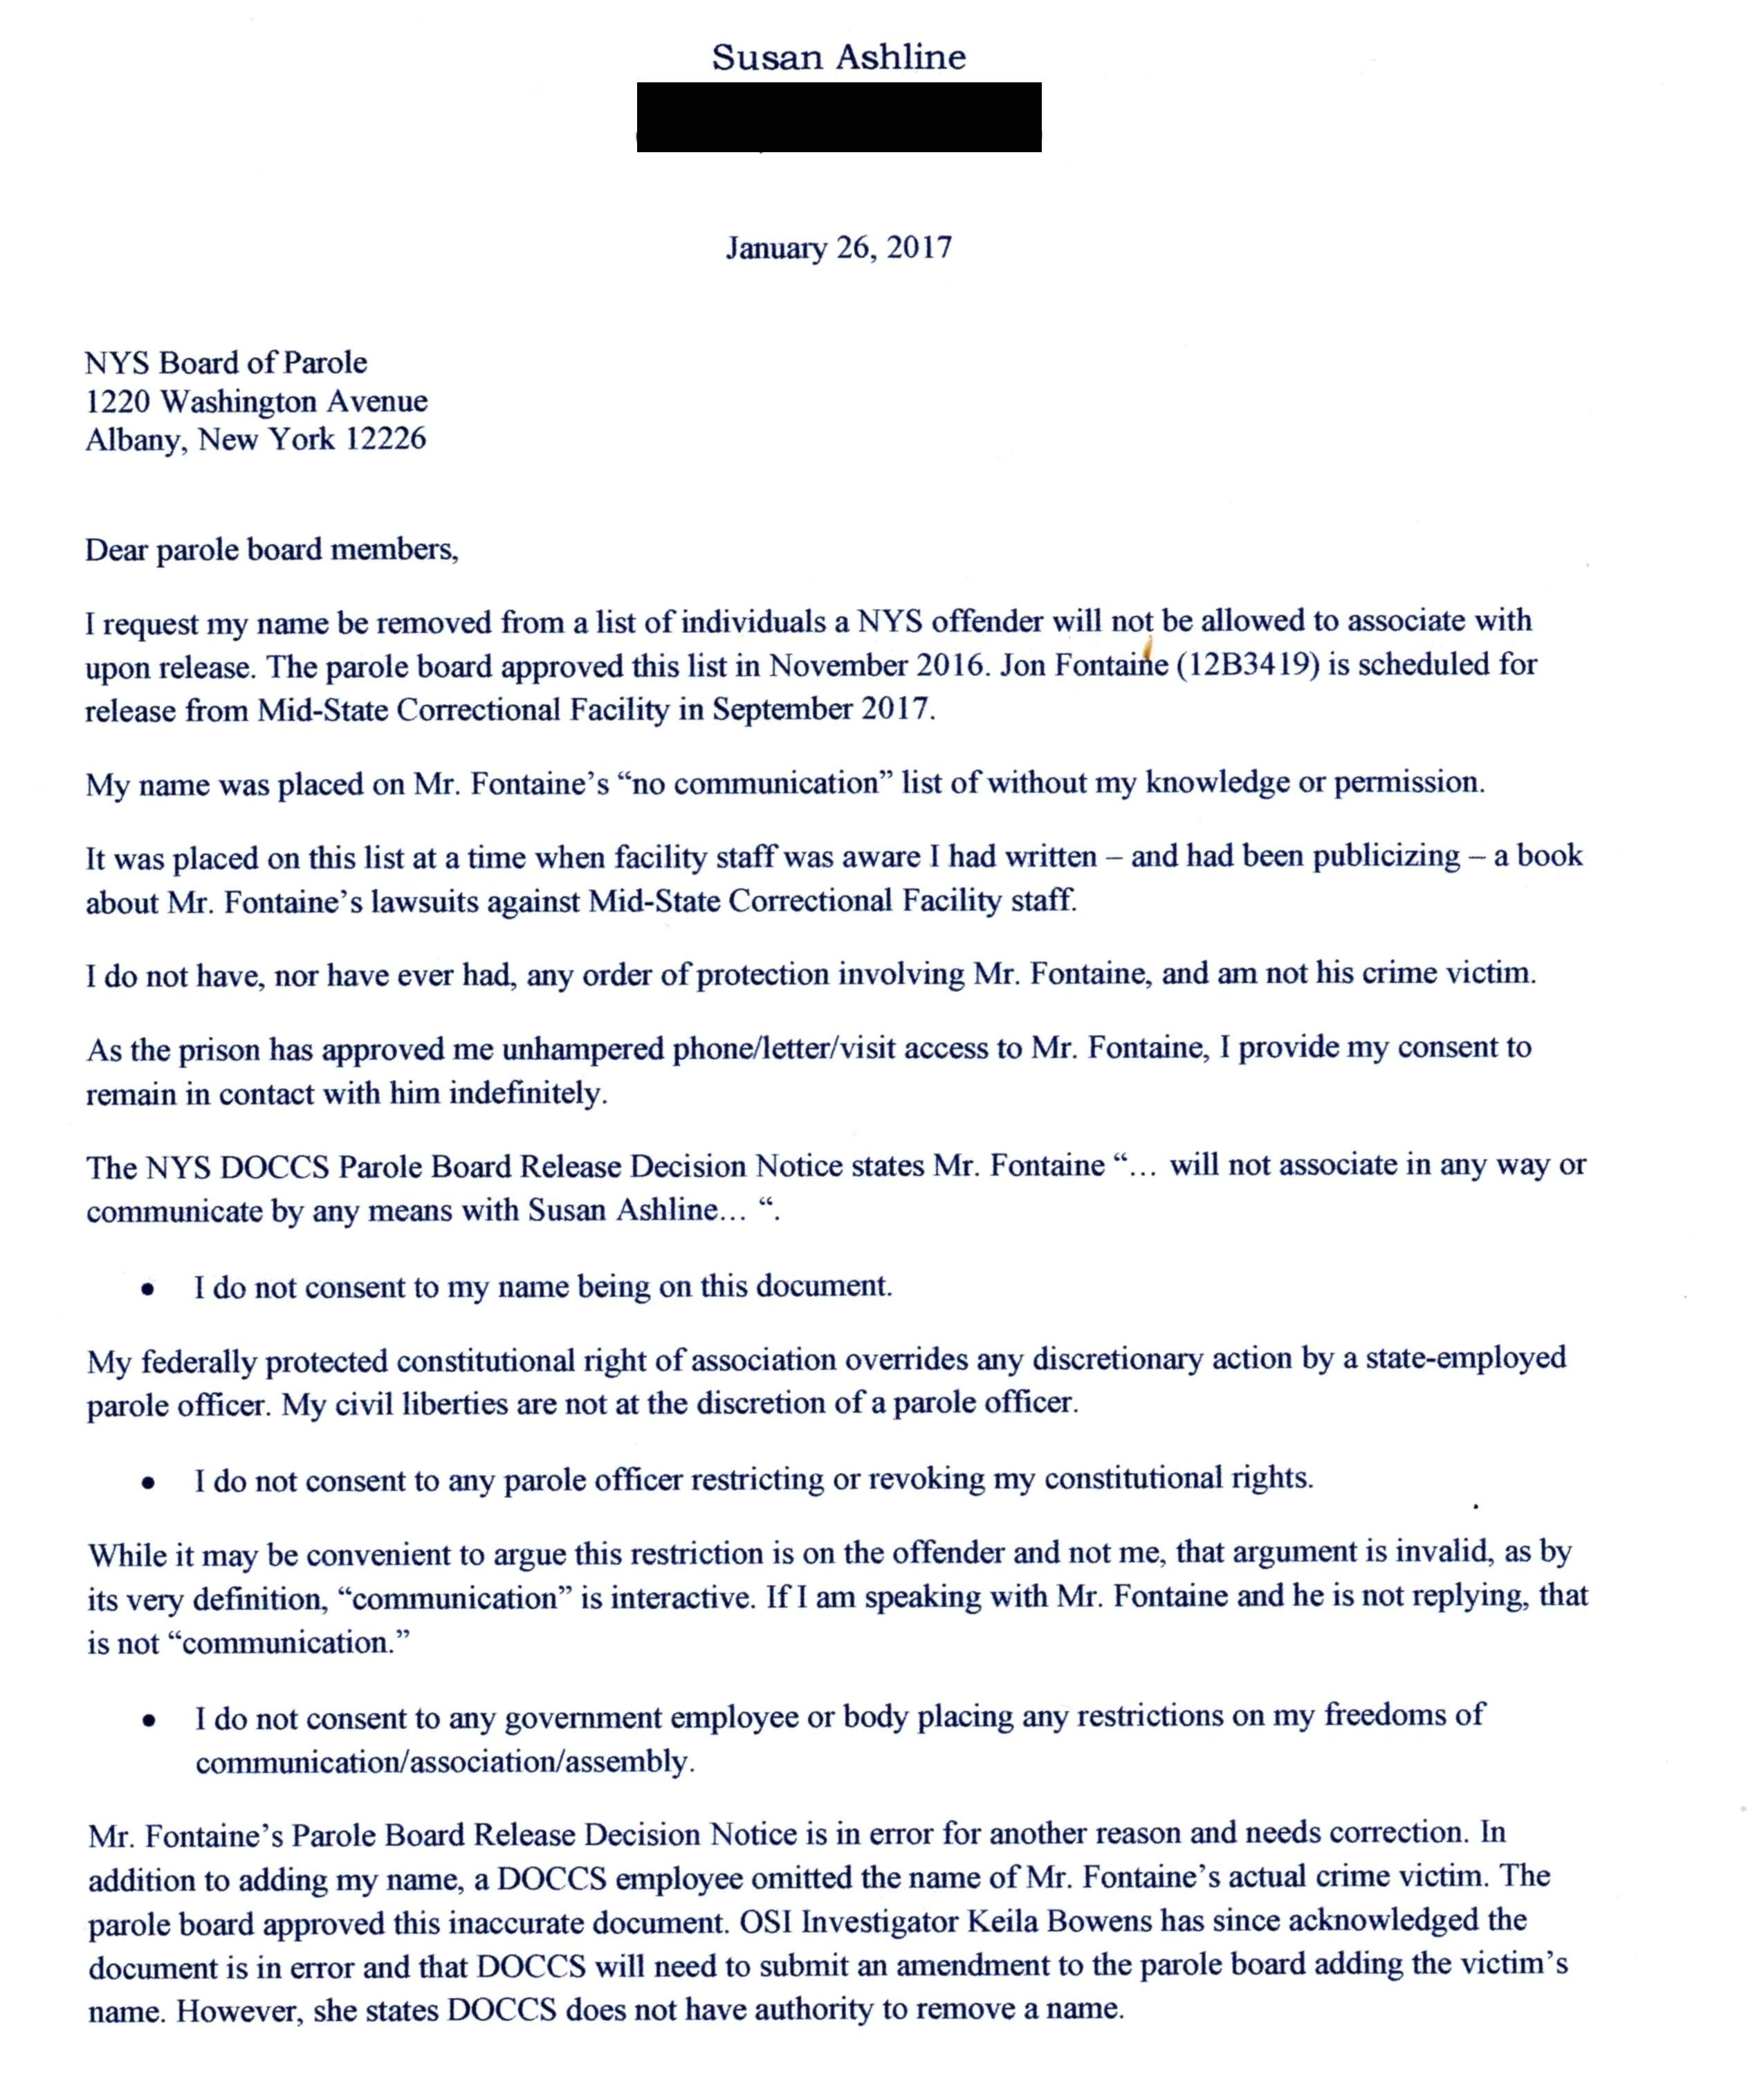 Parole Home Plan Approved Sample Letter for Parole Board Cover Letter Samples